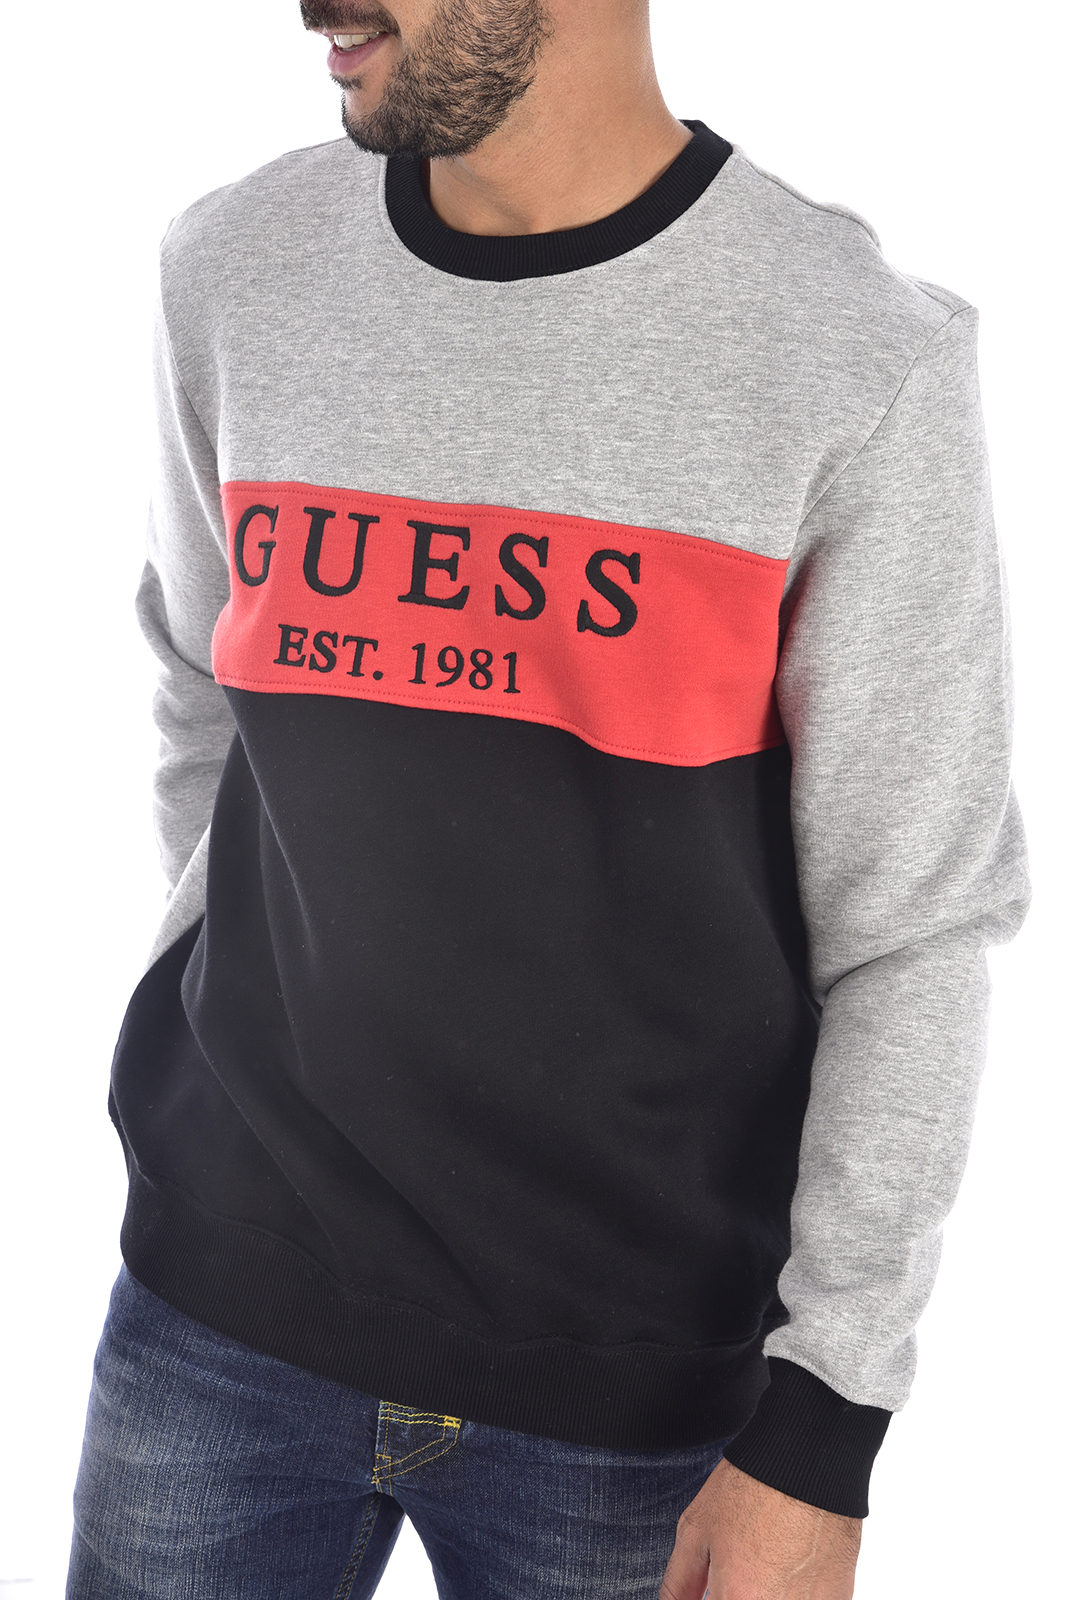 Pulls & Gilets  Guess jeans M94Q39 K92E0 F90G GREY BLACK ORANGE